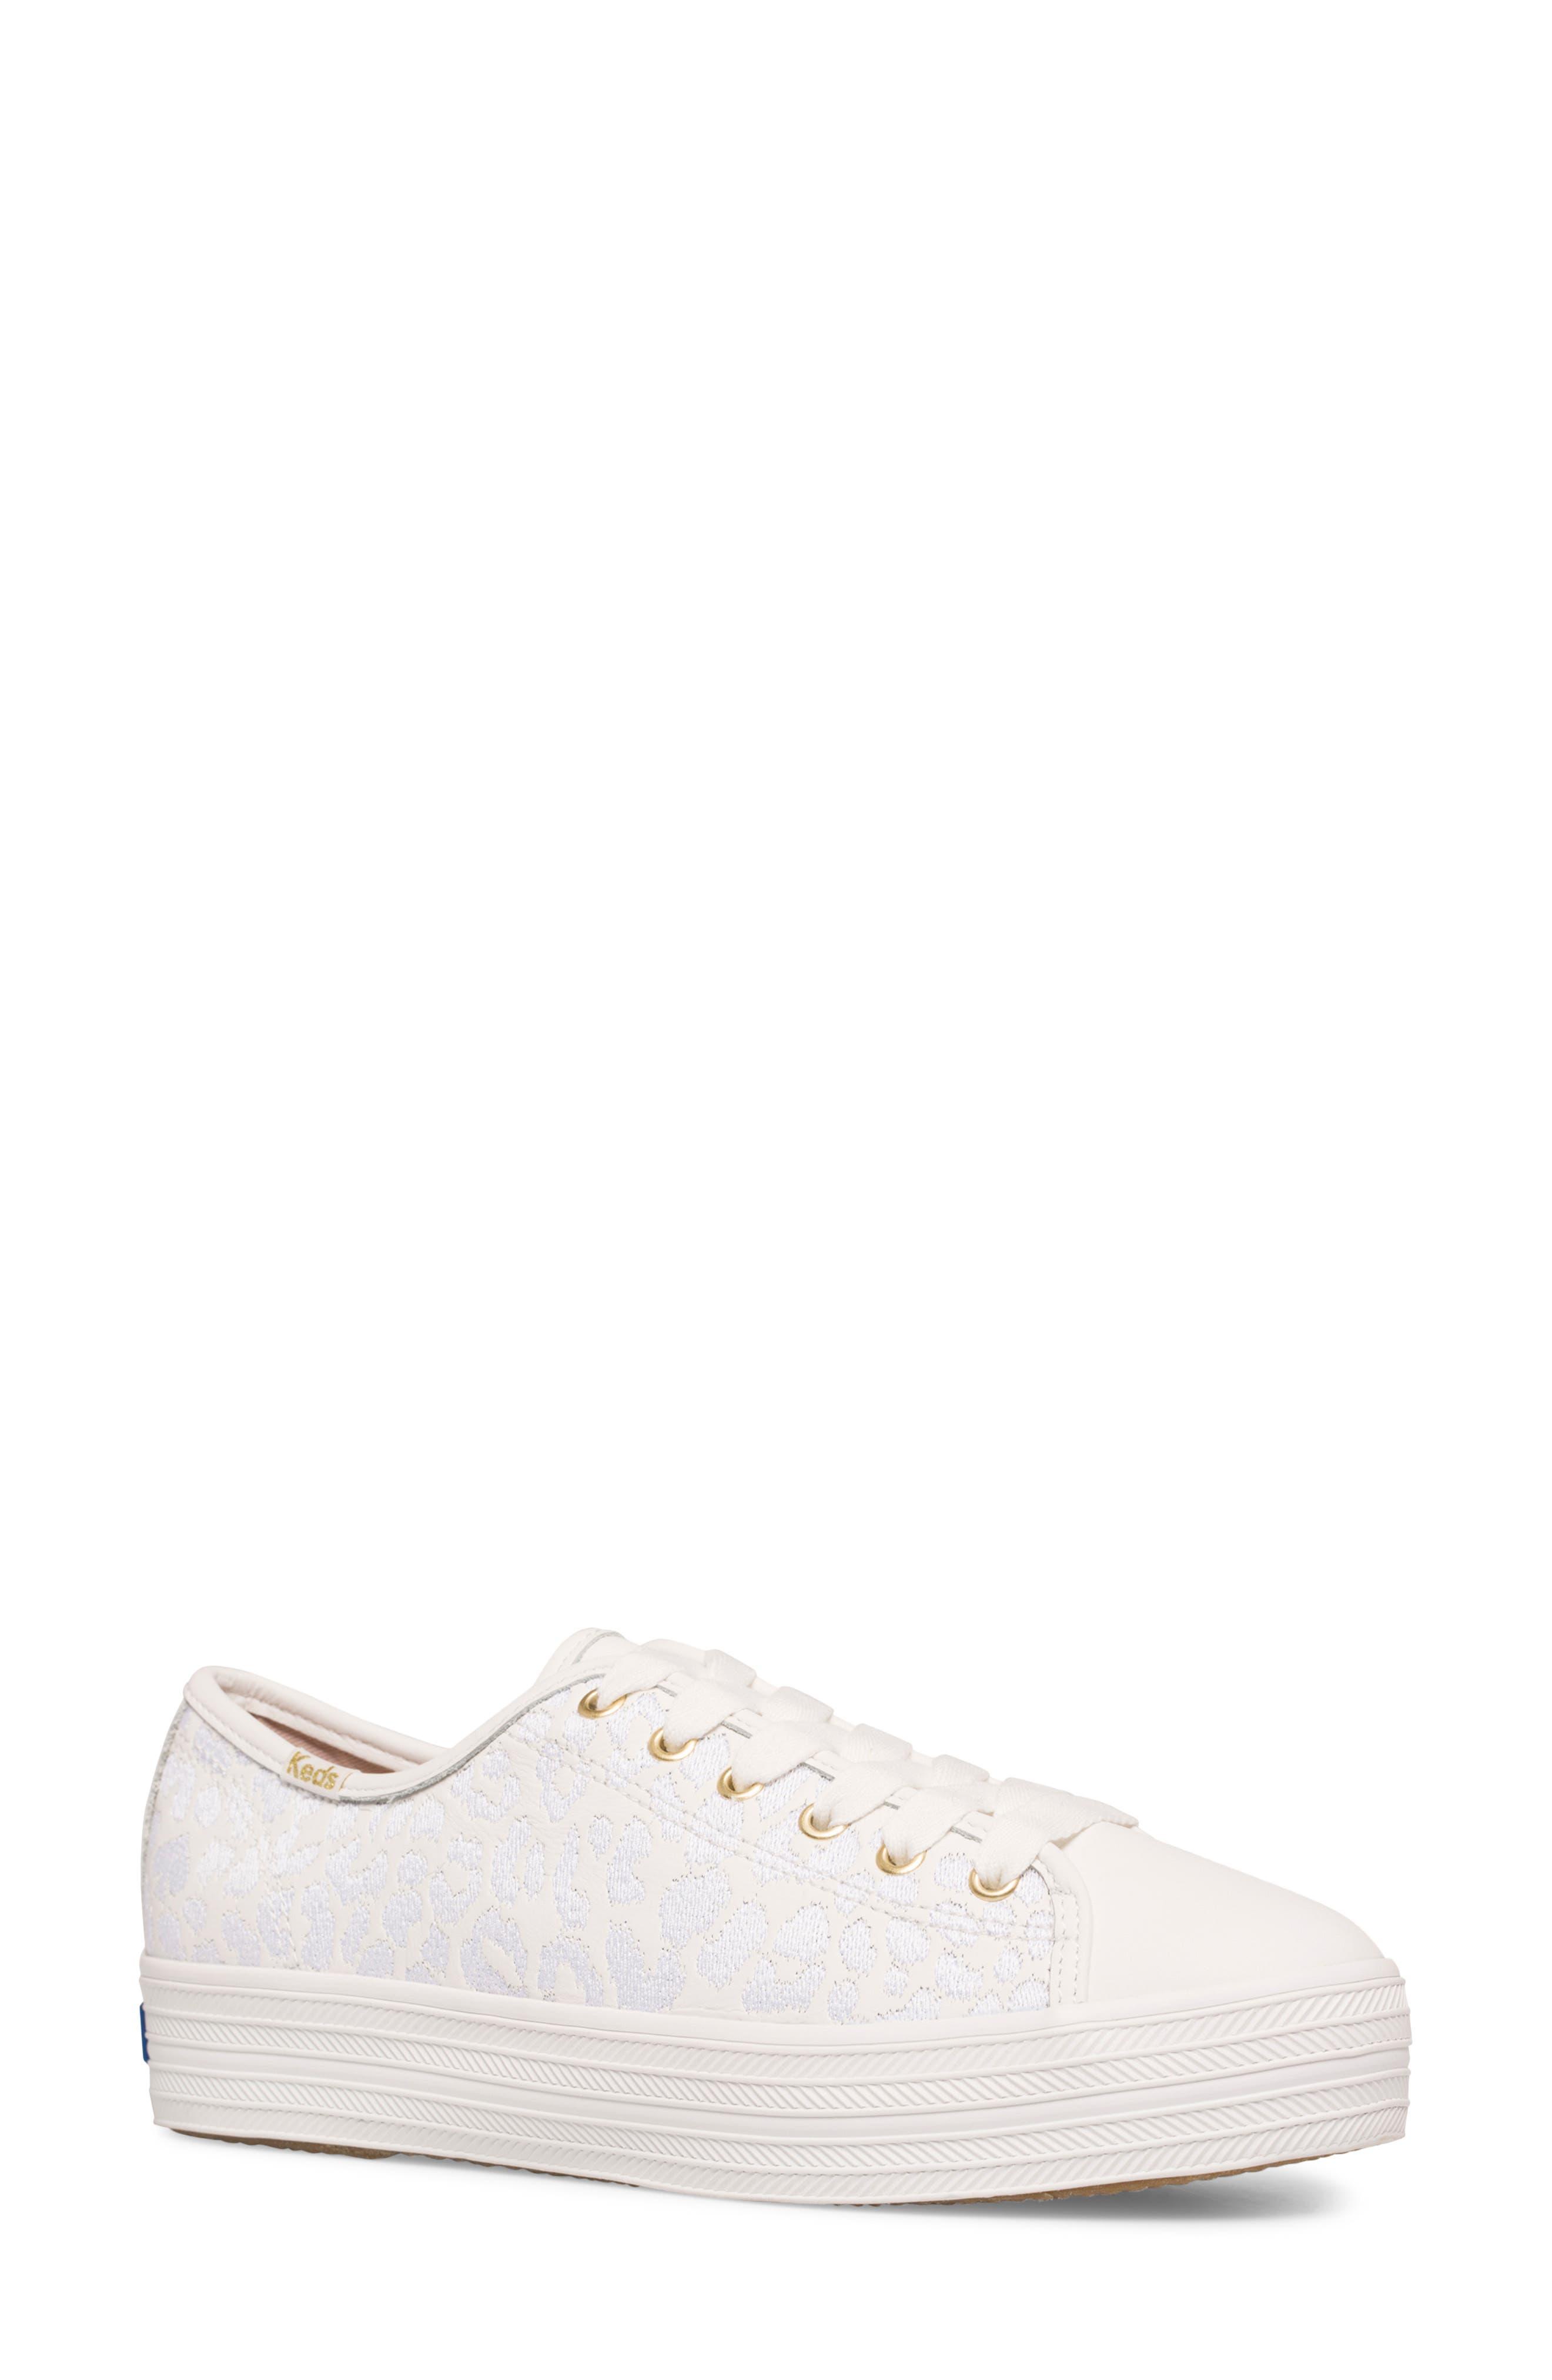 Women's Keds X Kate Spade New York Triple Kick Leopard Embroidered Sneaker